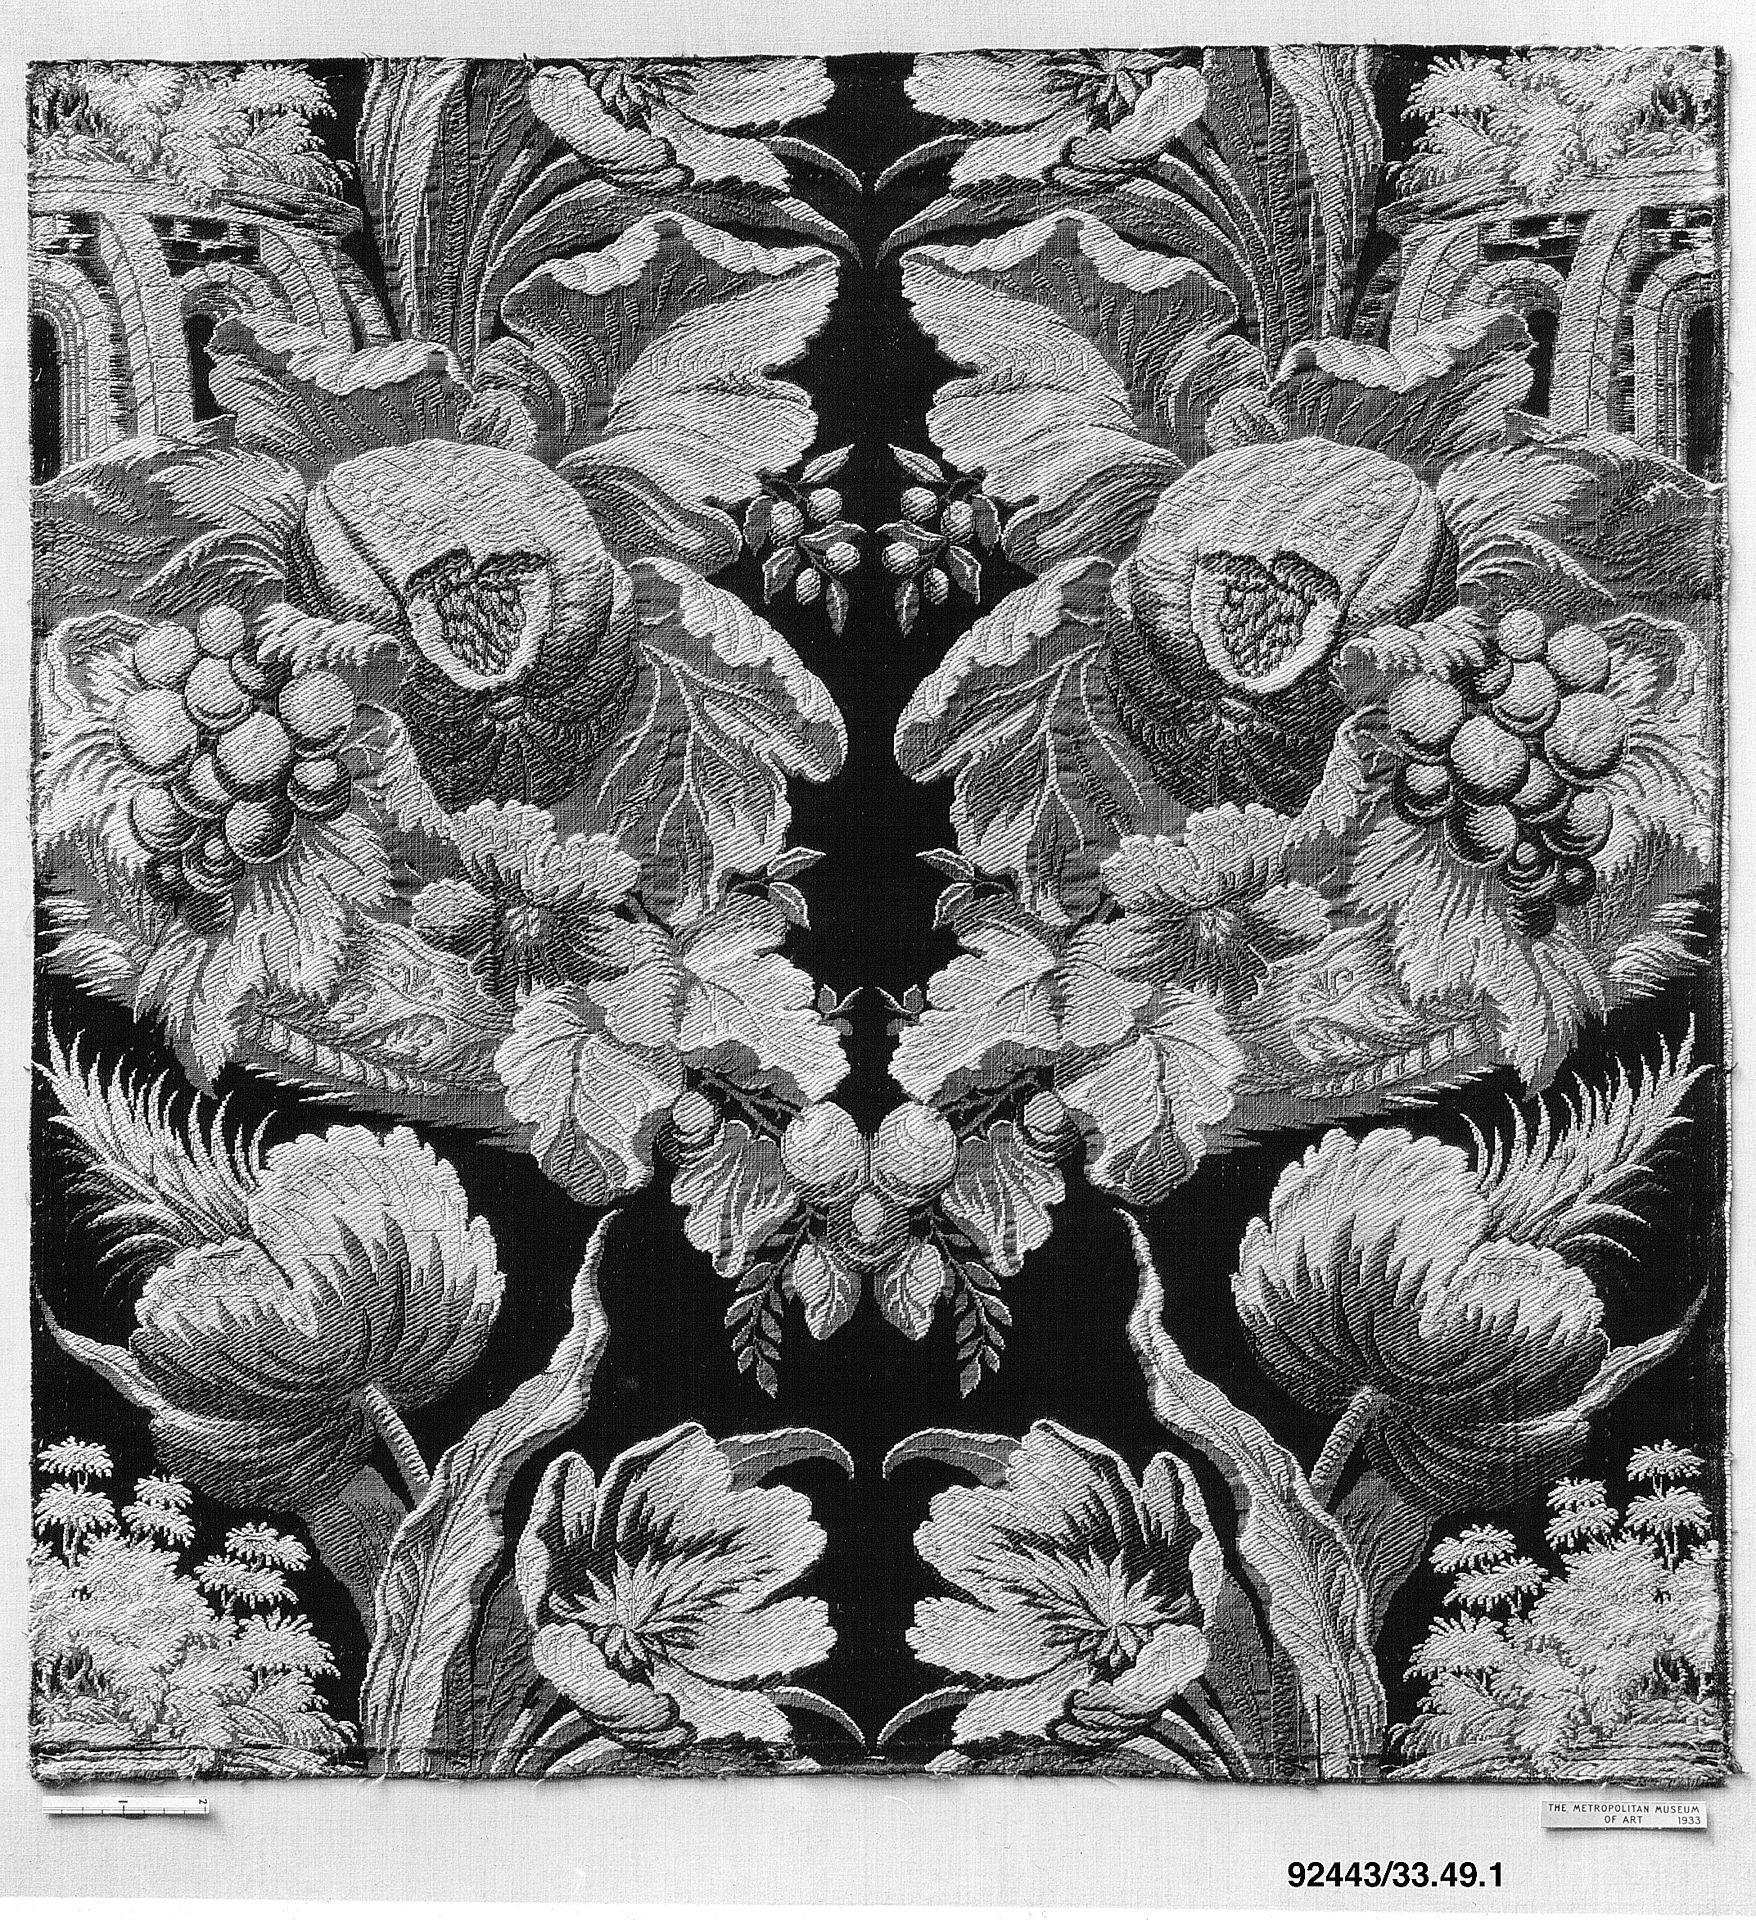 Fragment d'un tissu conçu par Jean Revel (con imágenes